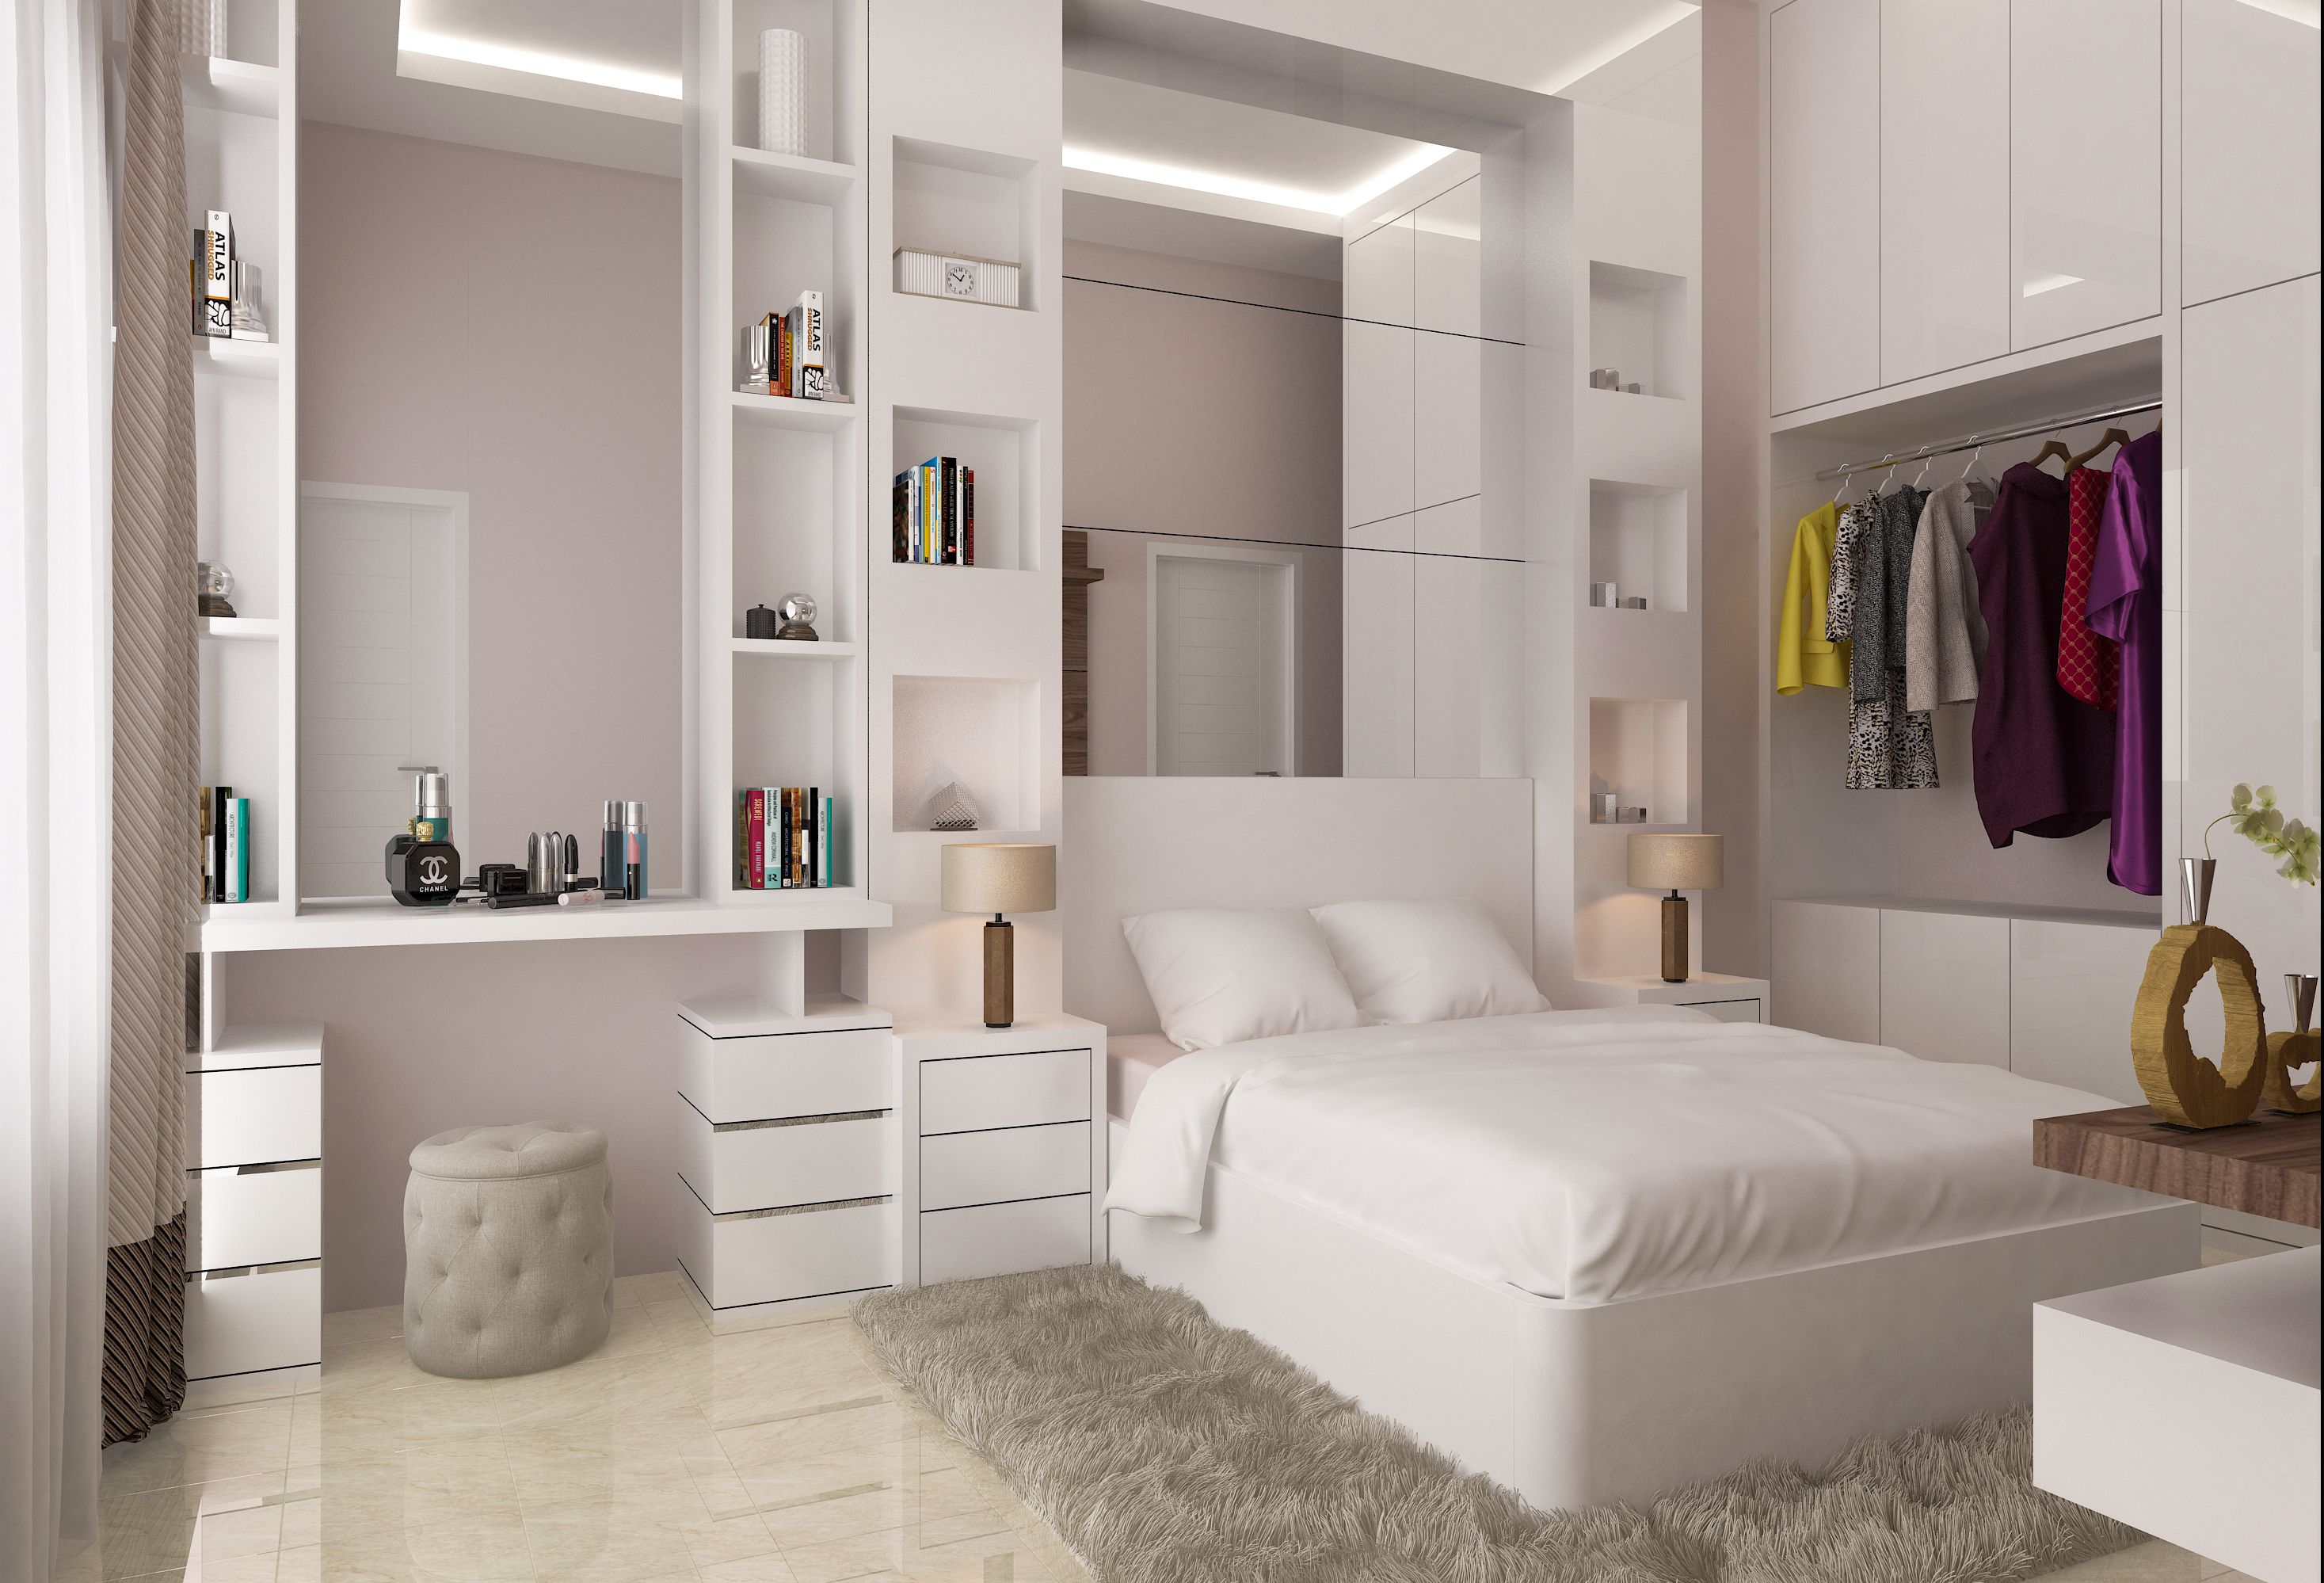 Kamar anak perempuan proyek kutisari also portofolio desain interior rh pinterest